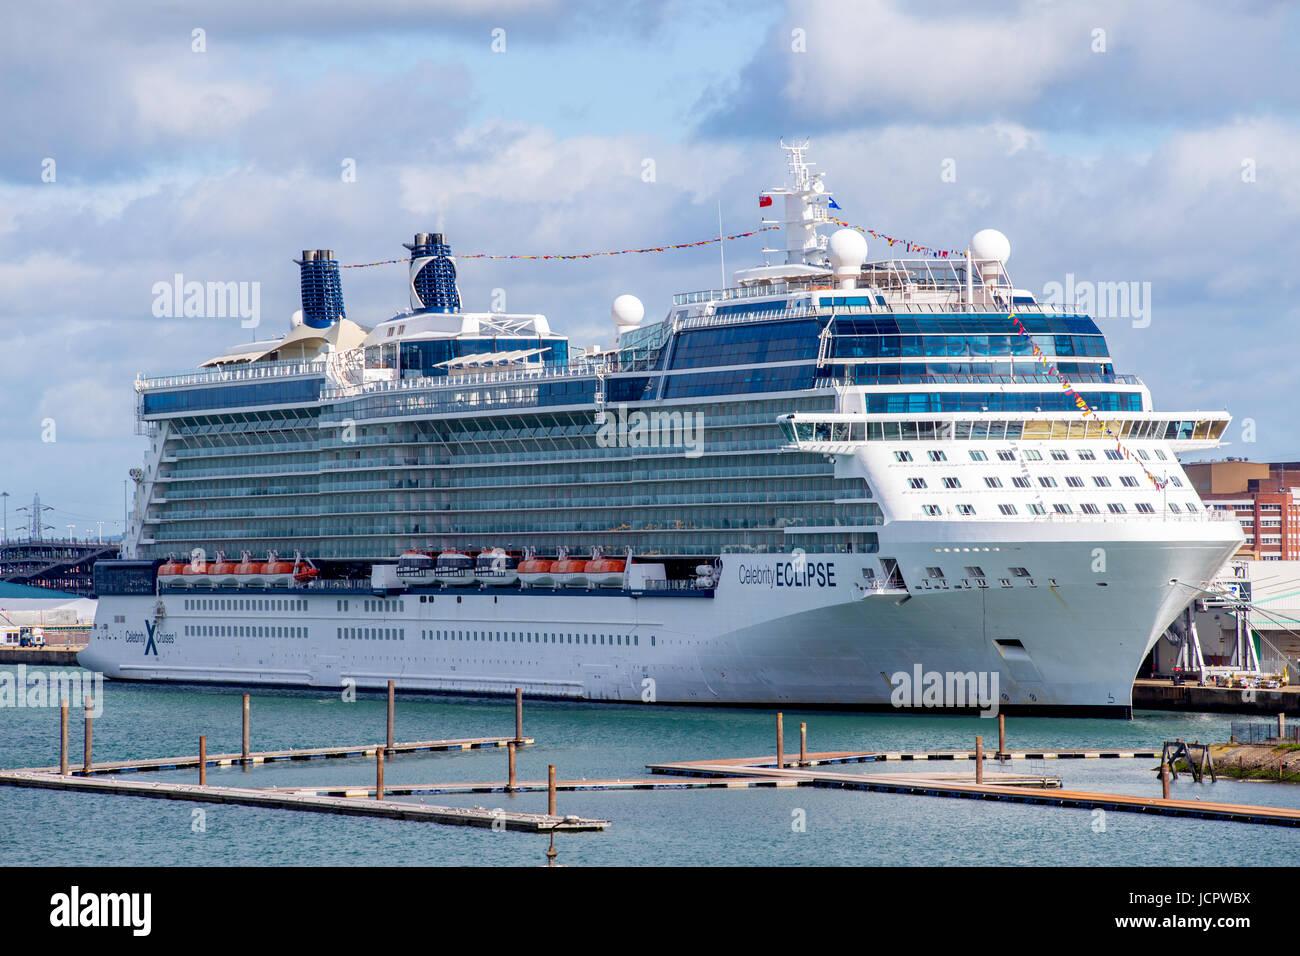 Celebrity Eclipse cruise ship docked in Southampton port, England - Stock Image